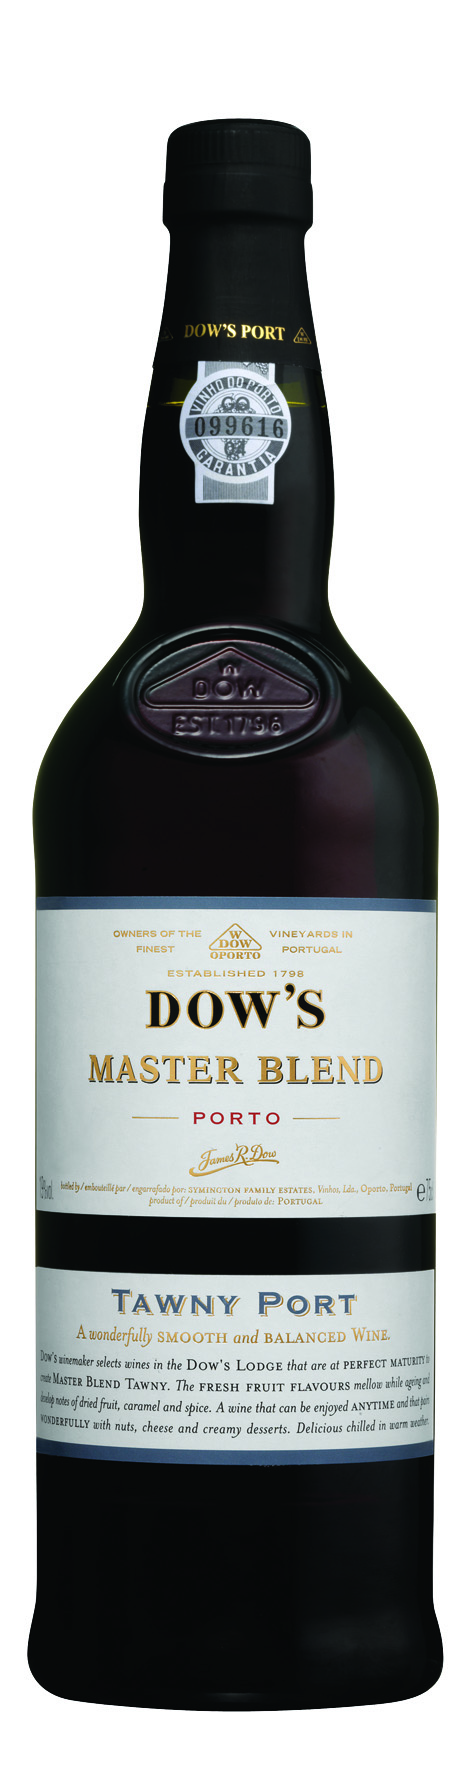 DOW's Masterblend Tawny Port